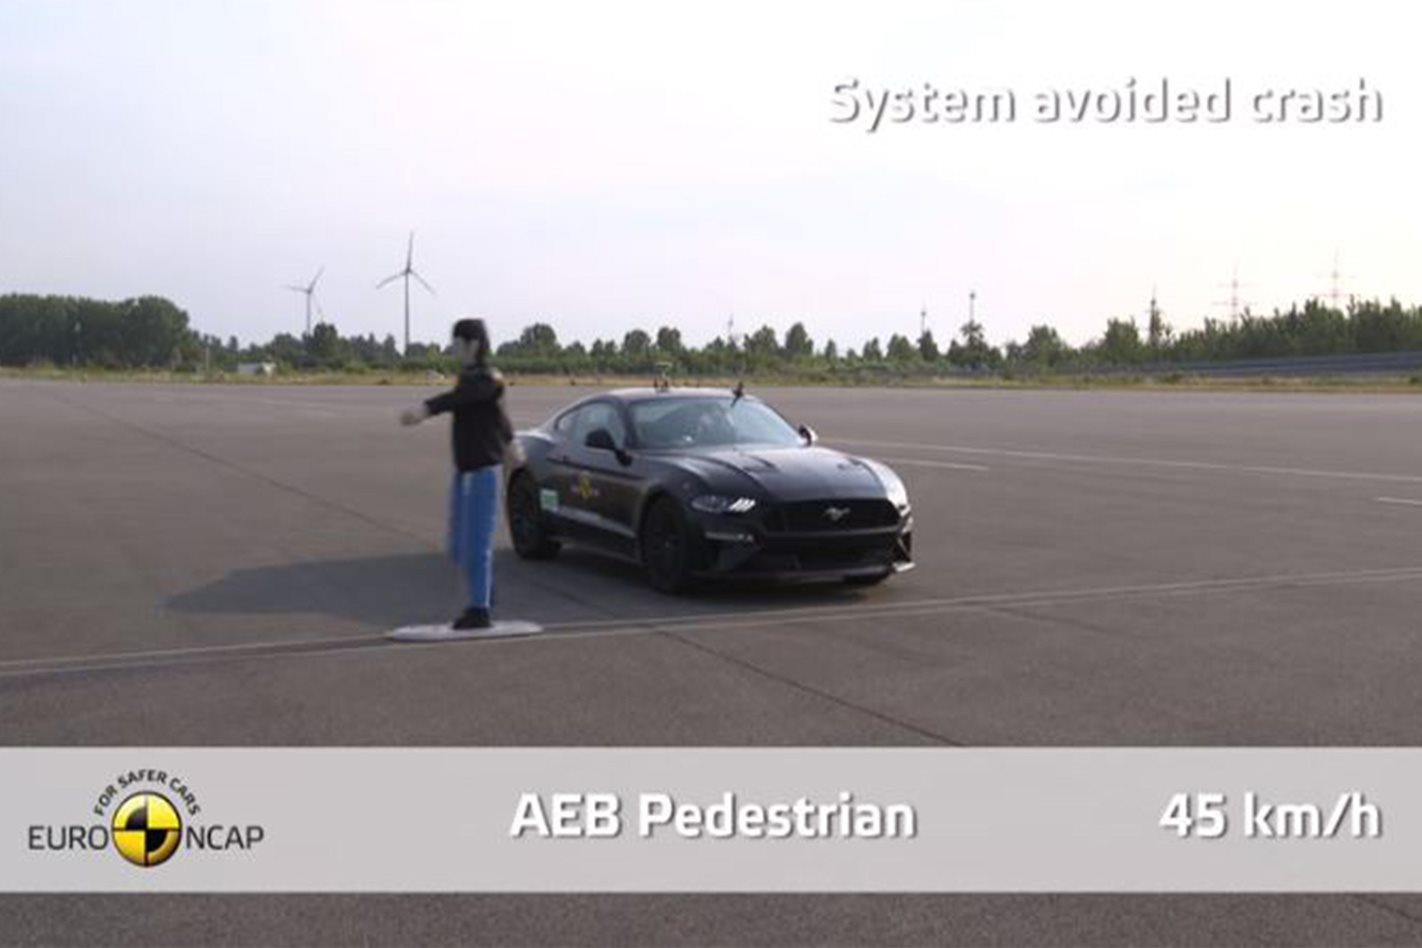 AEB Pedestrian EURO NCAP testing